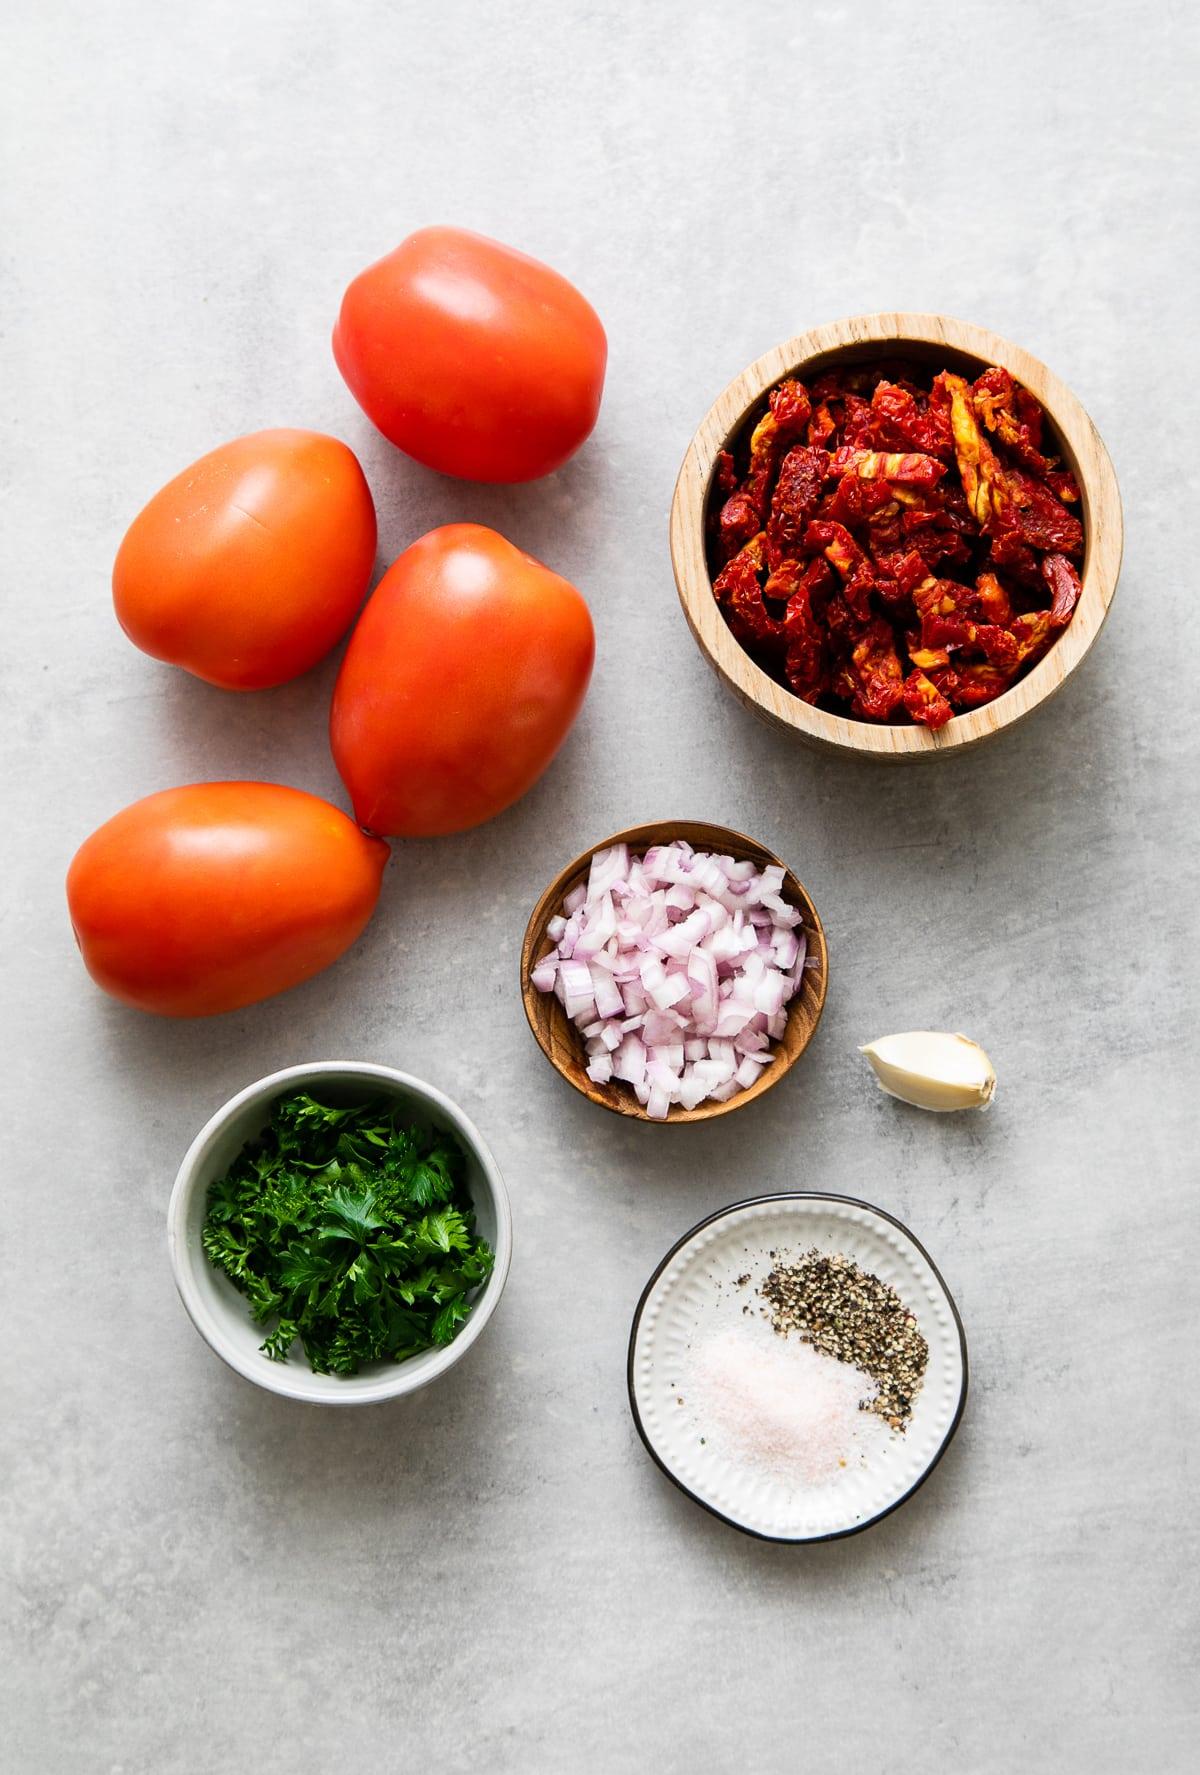 top down view of ingredients used to make raw marinara sauce recipe.